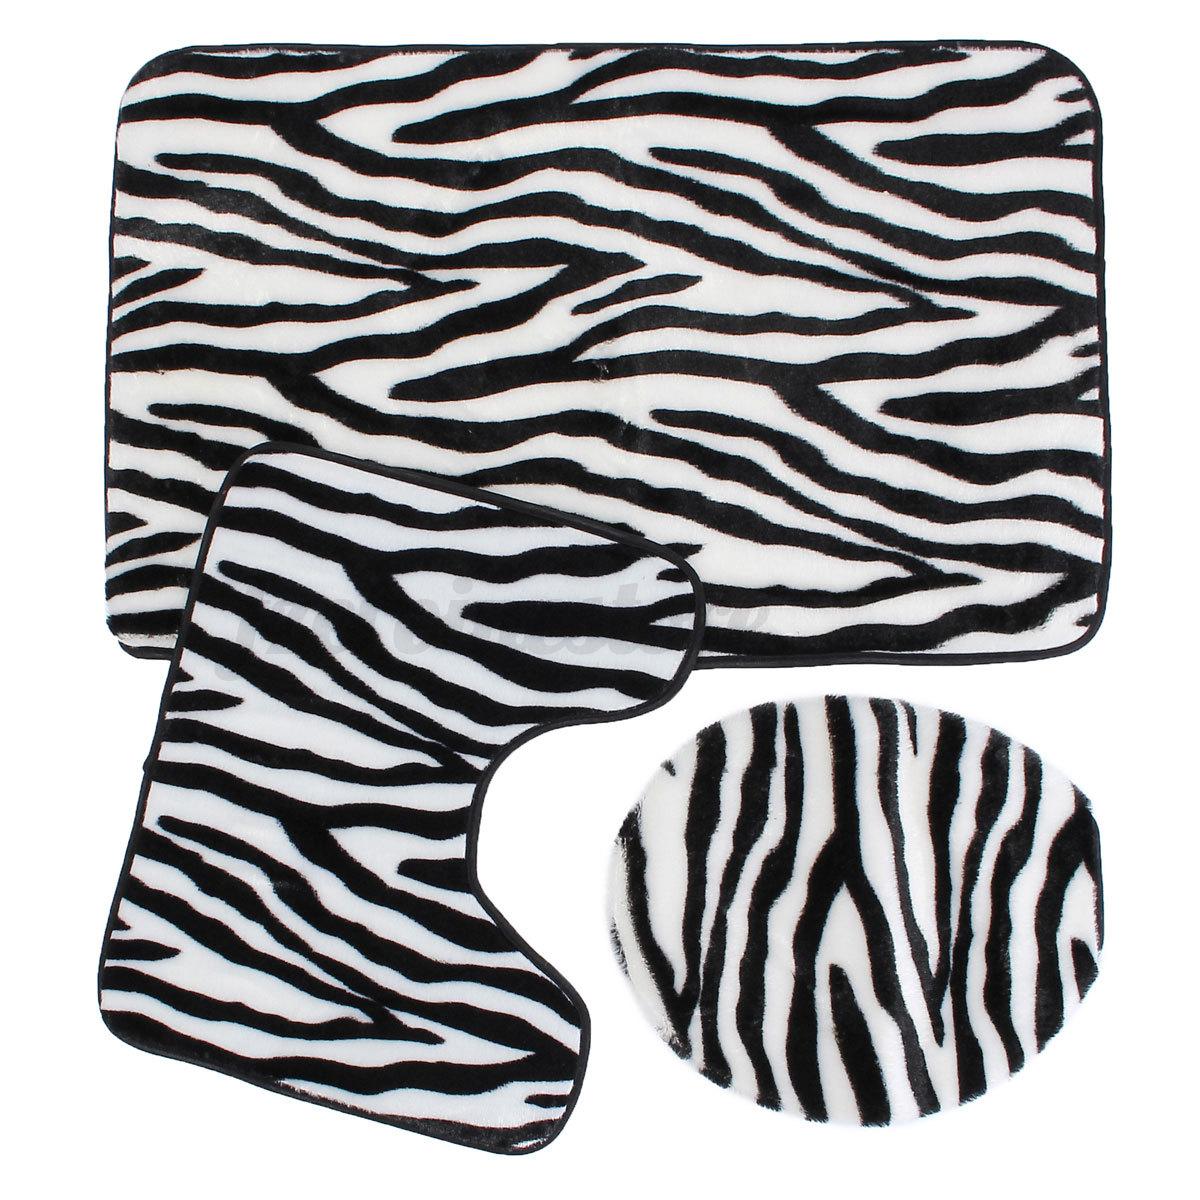 3 Pc Zebra Leopard Print Toilet Cover Set Bathroom Mat Rug